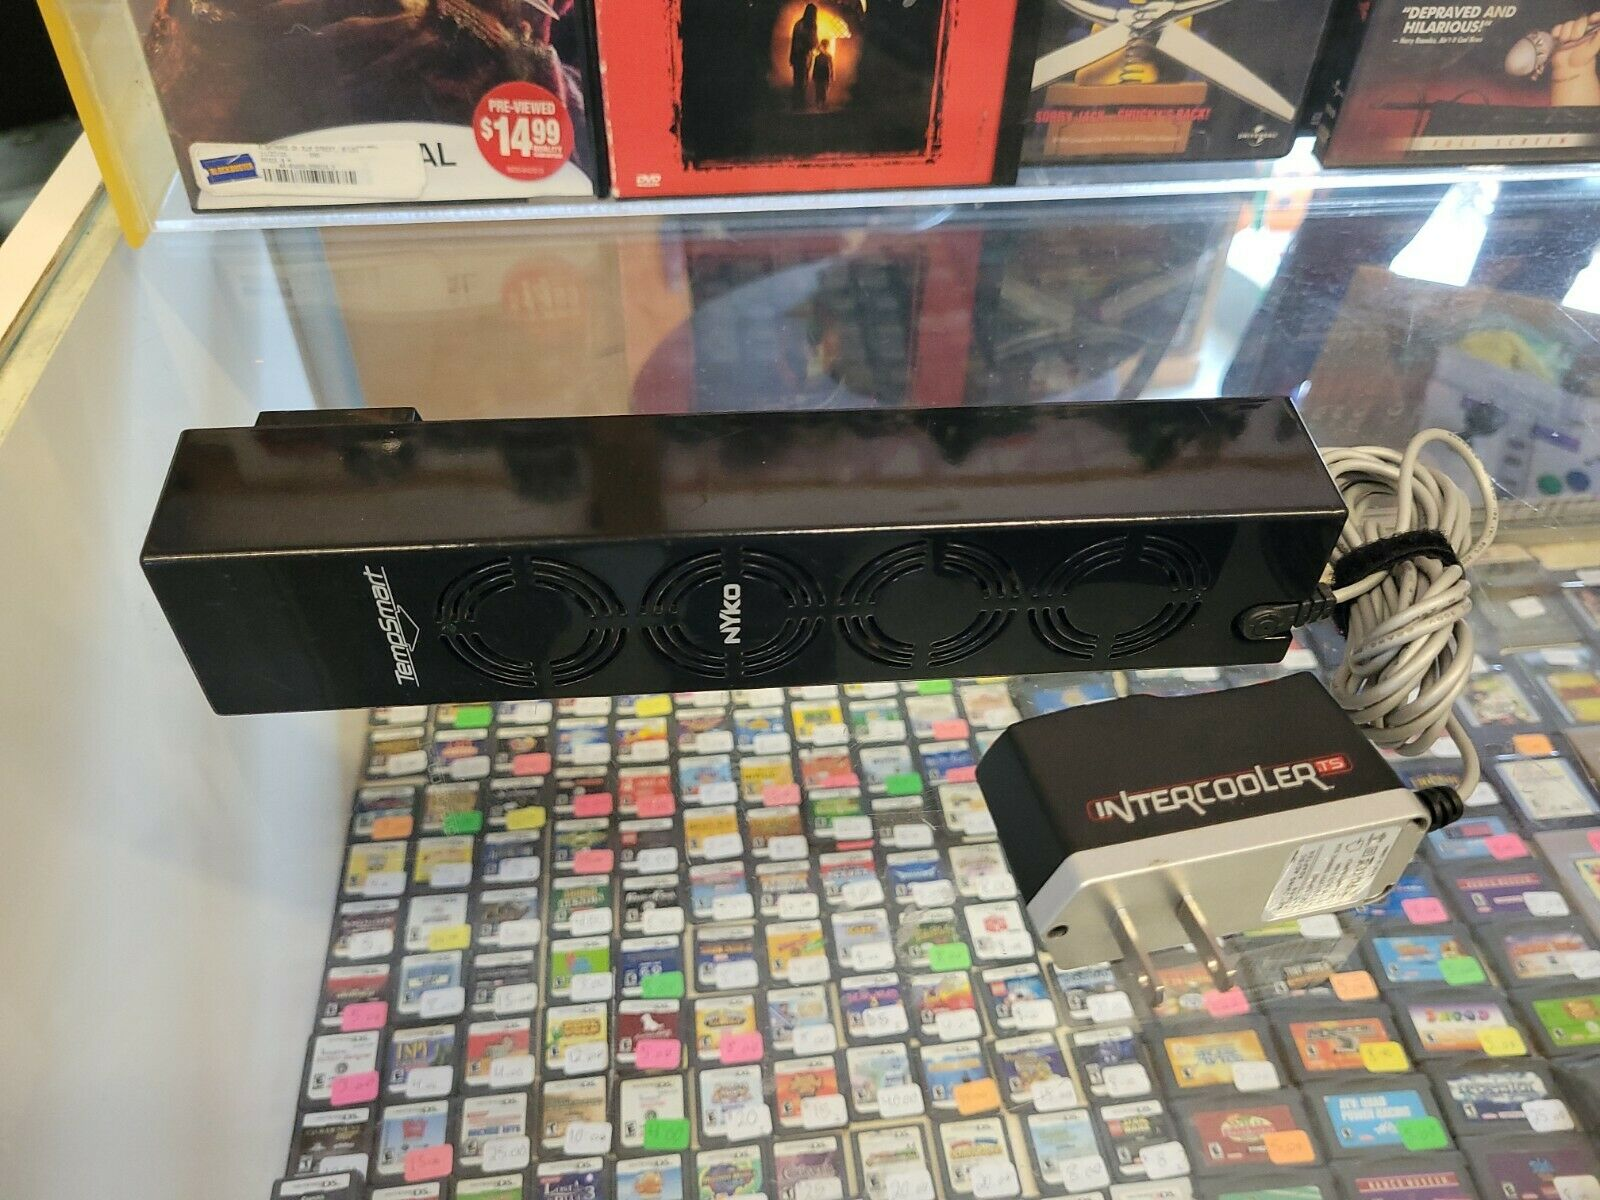 Nyko PlayStation 3 PS3 Intercooler Temp Sensing Snap On Cooling Device